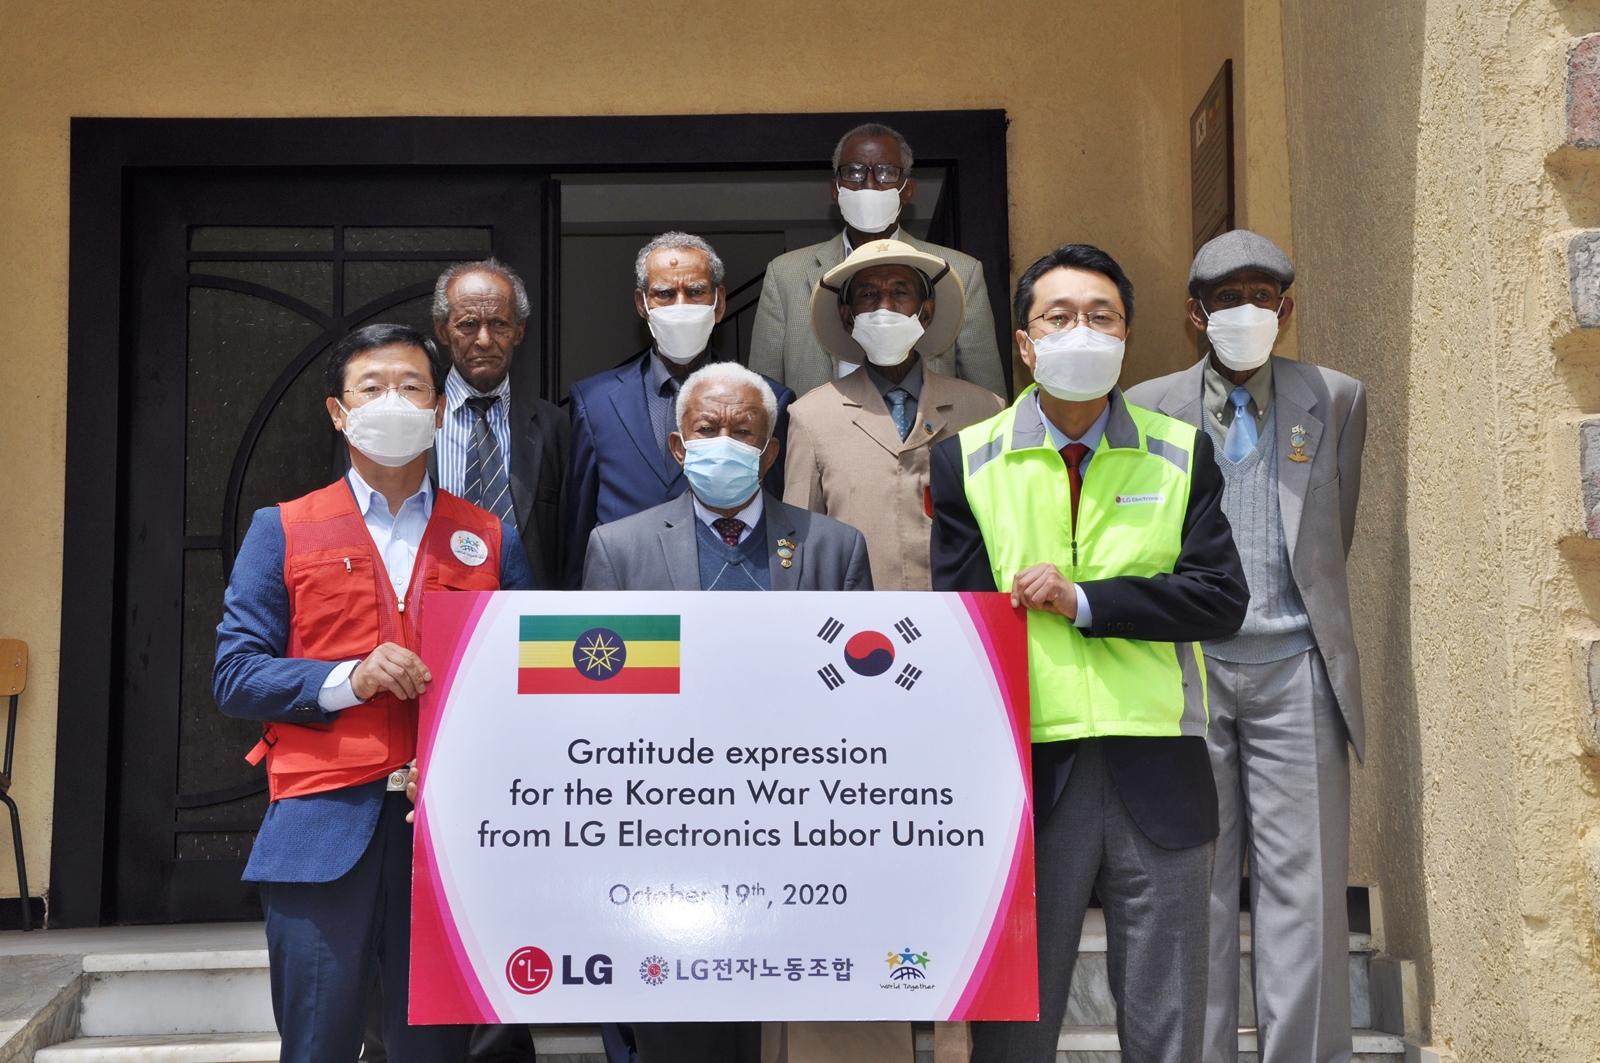 LG전자 노동조합, 에티오피아 참전용사에 생활지원금 전달